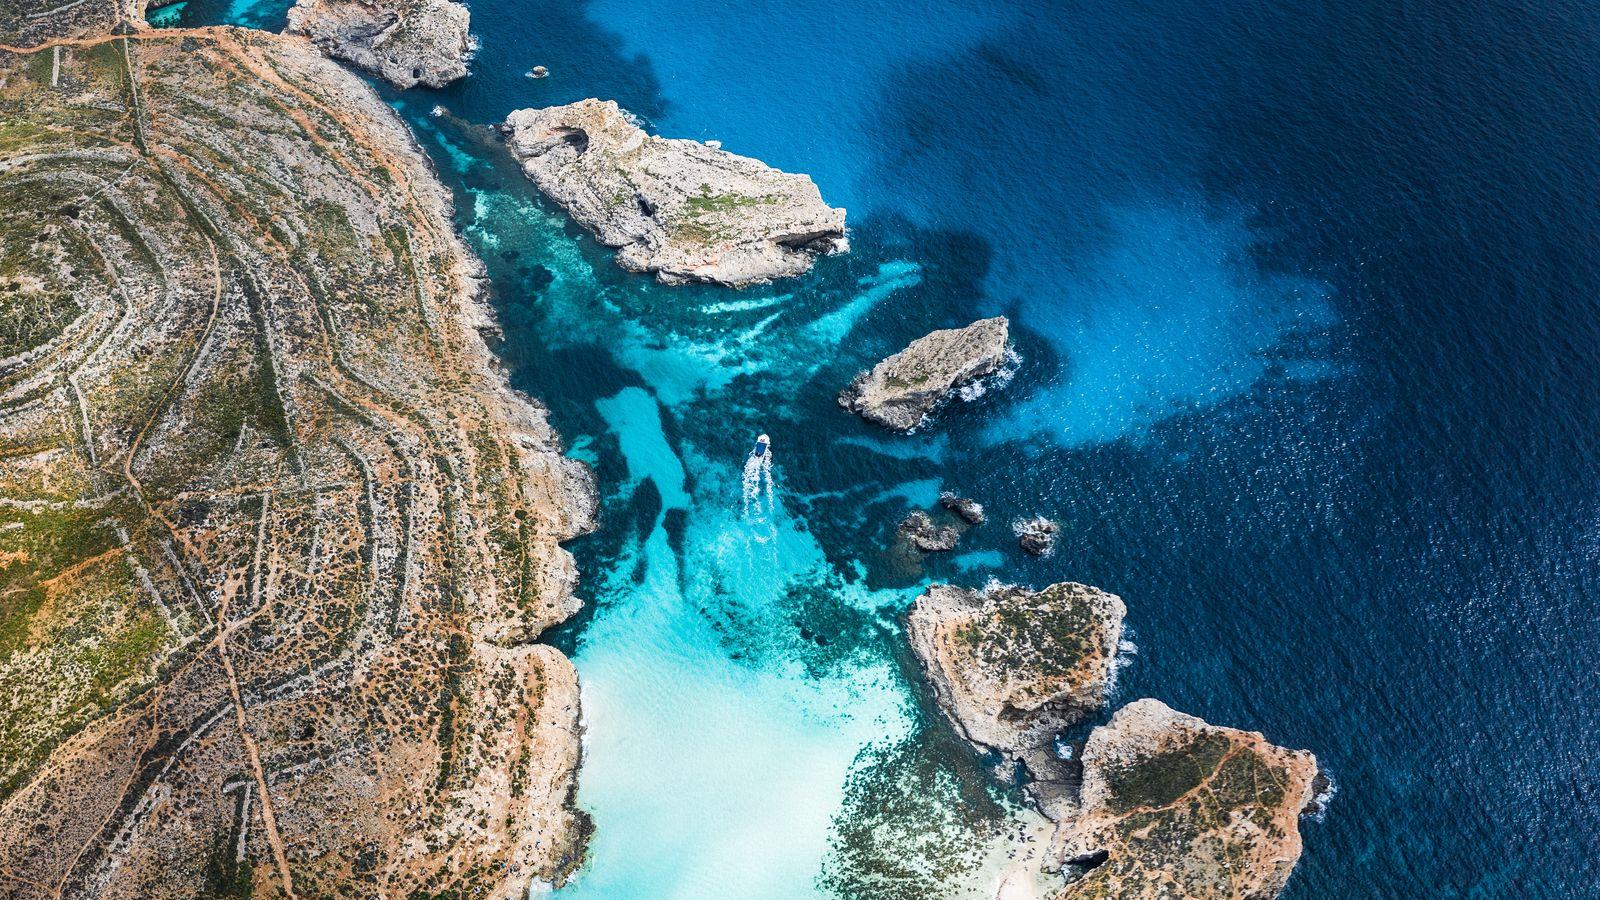 Download wallpaper 1600x900 bay coast stony ocean island 1600x900